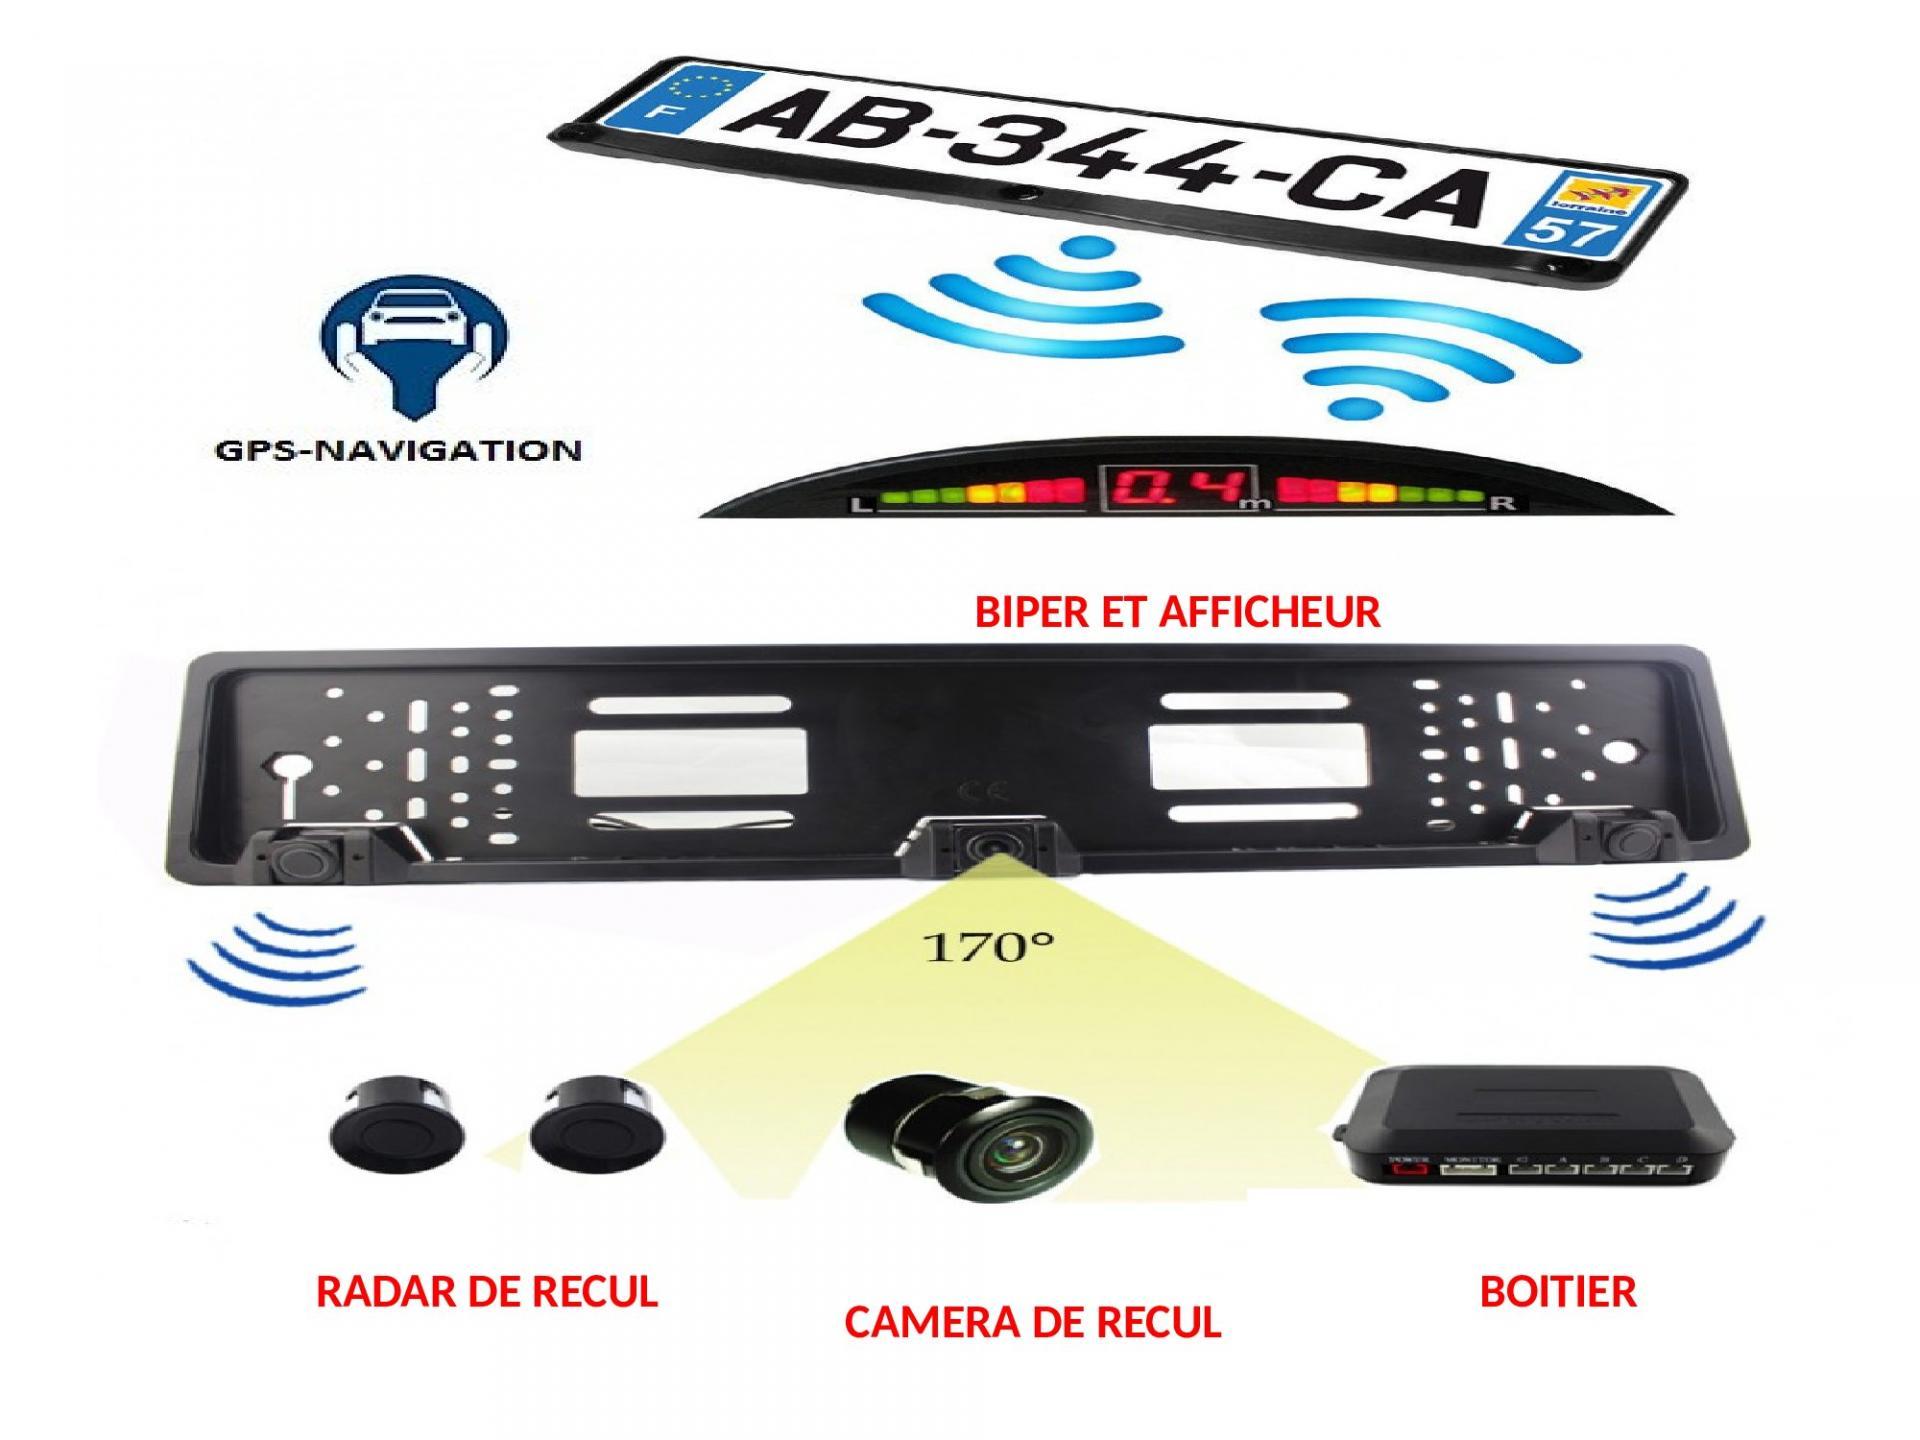 Sans fil wifi cadre de plaque d immatriculation camera de recul de recul radar de recul vision nocture 2